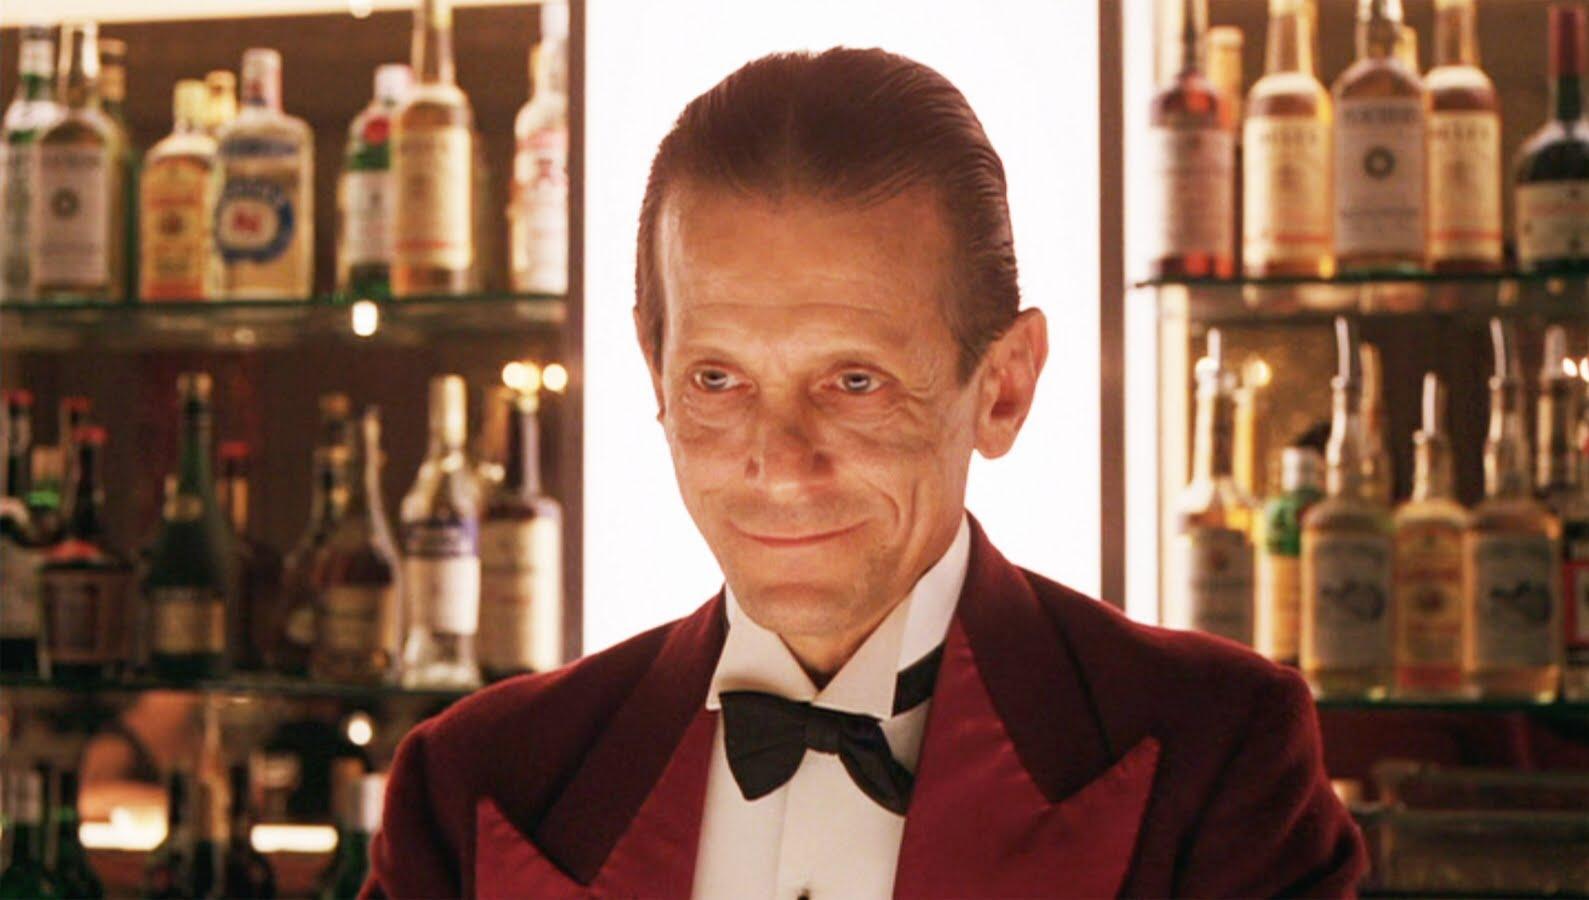 Lloyd the Bartender